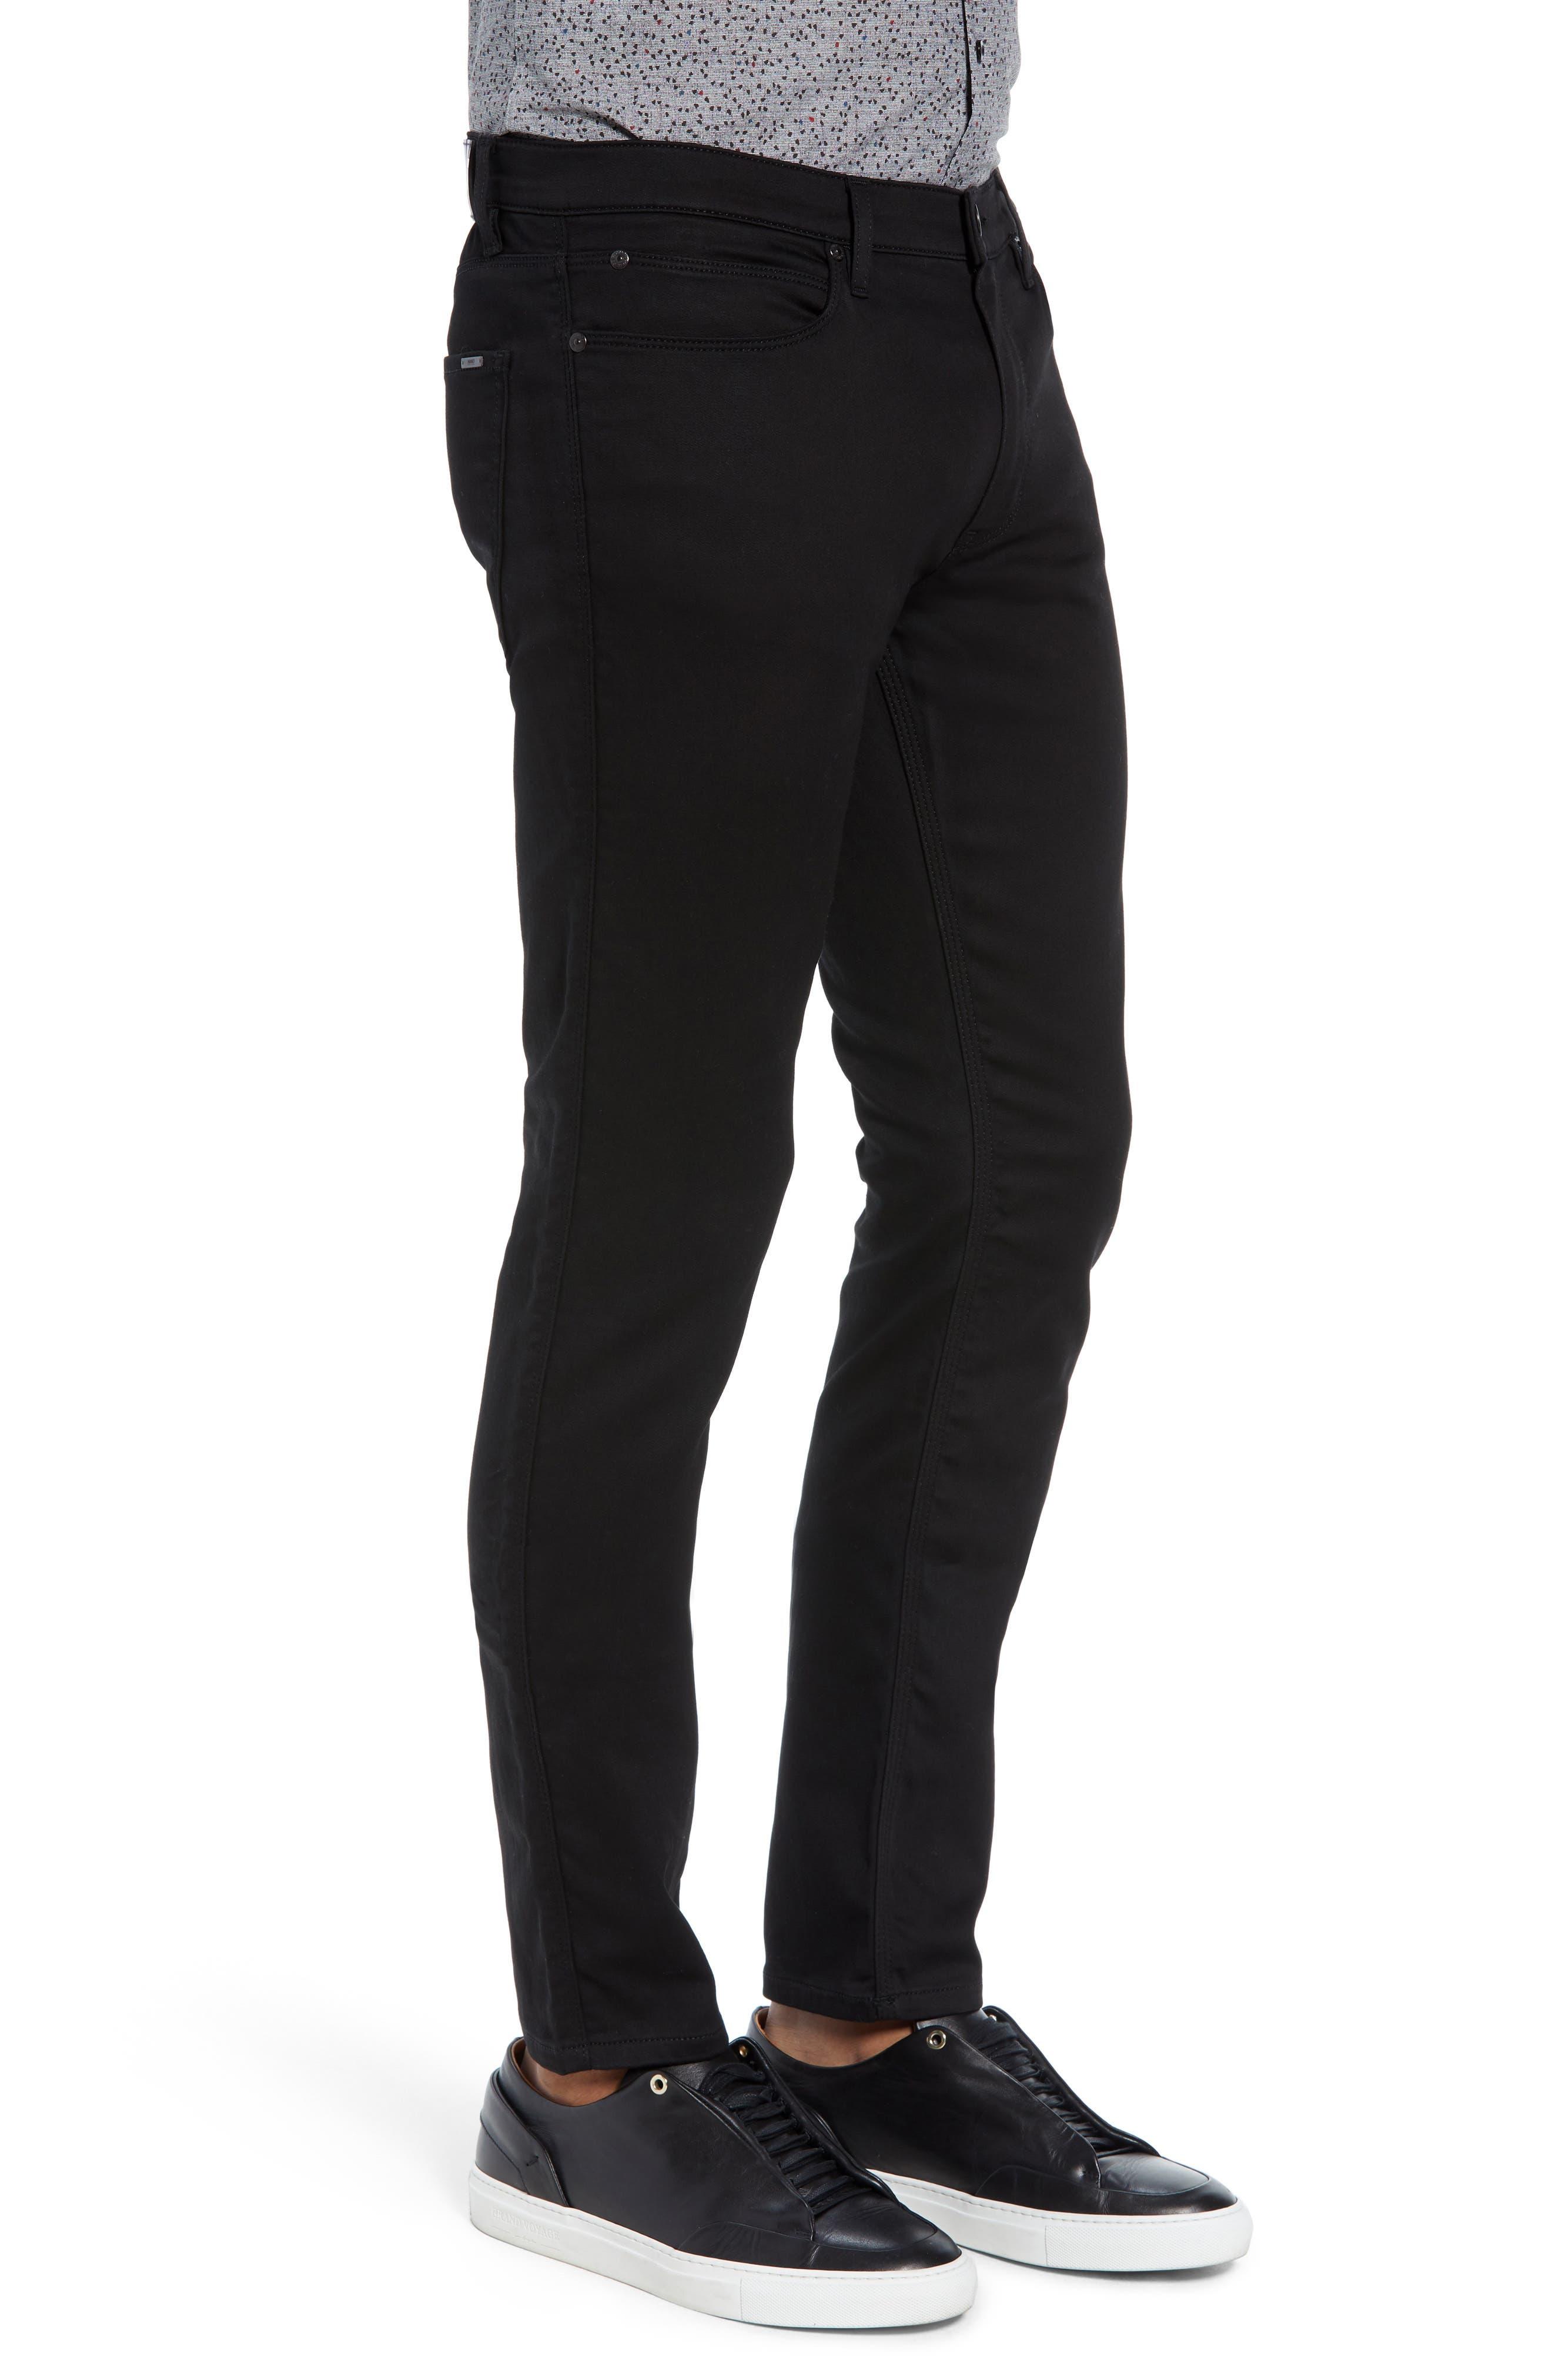 734 Skinny Fit Jeans,                             Alternate thumbnail 3, color,                             BLACK